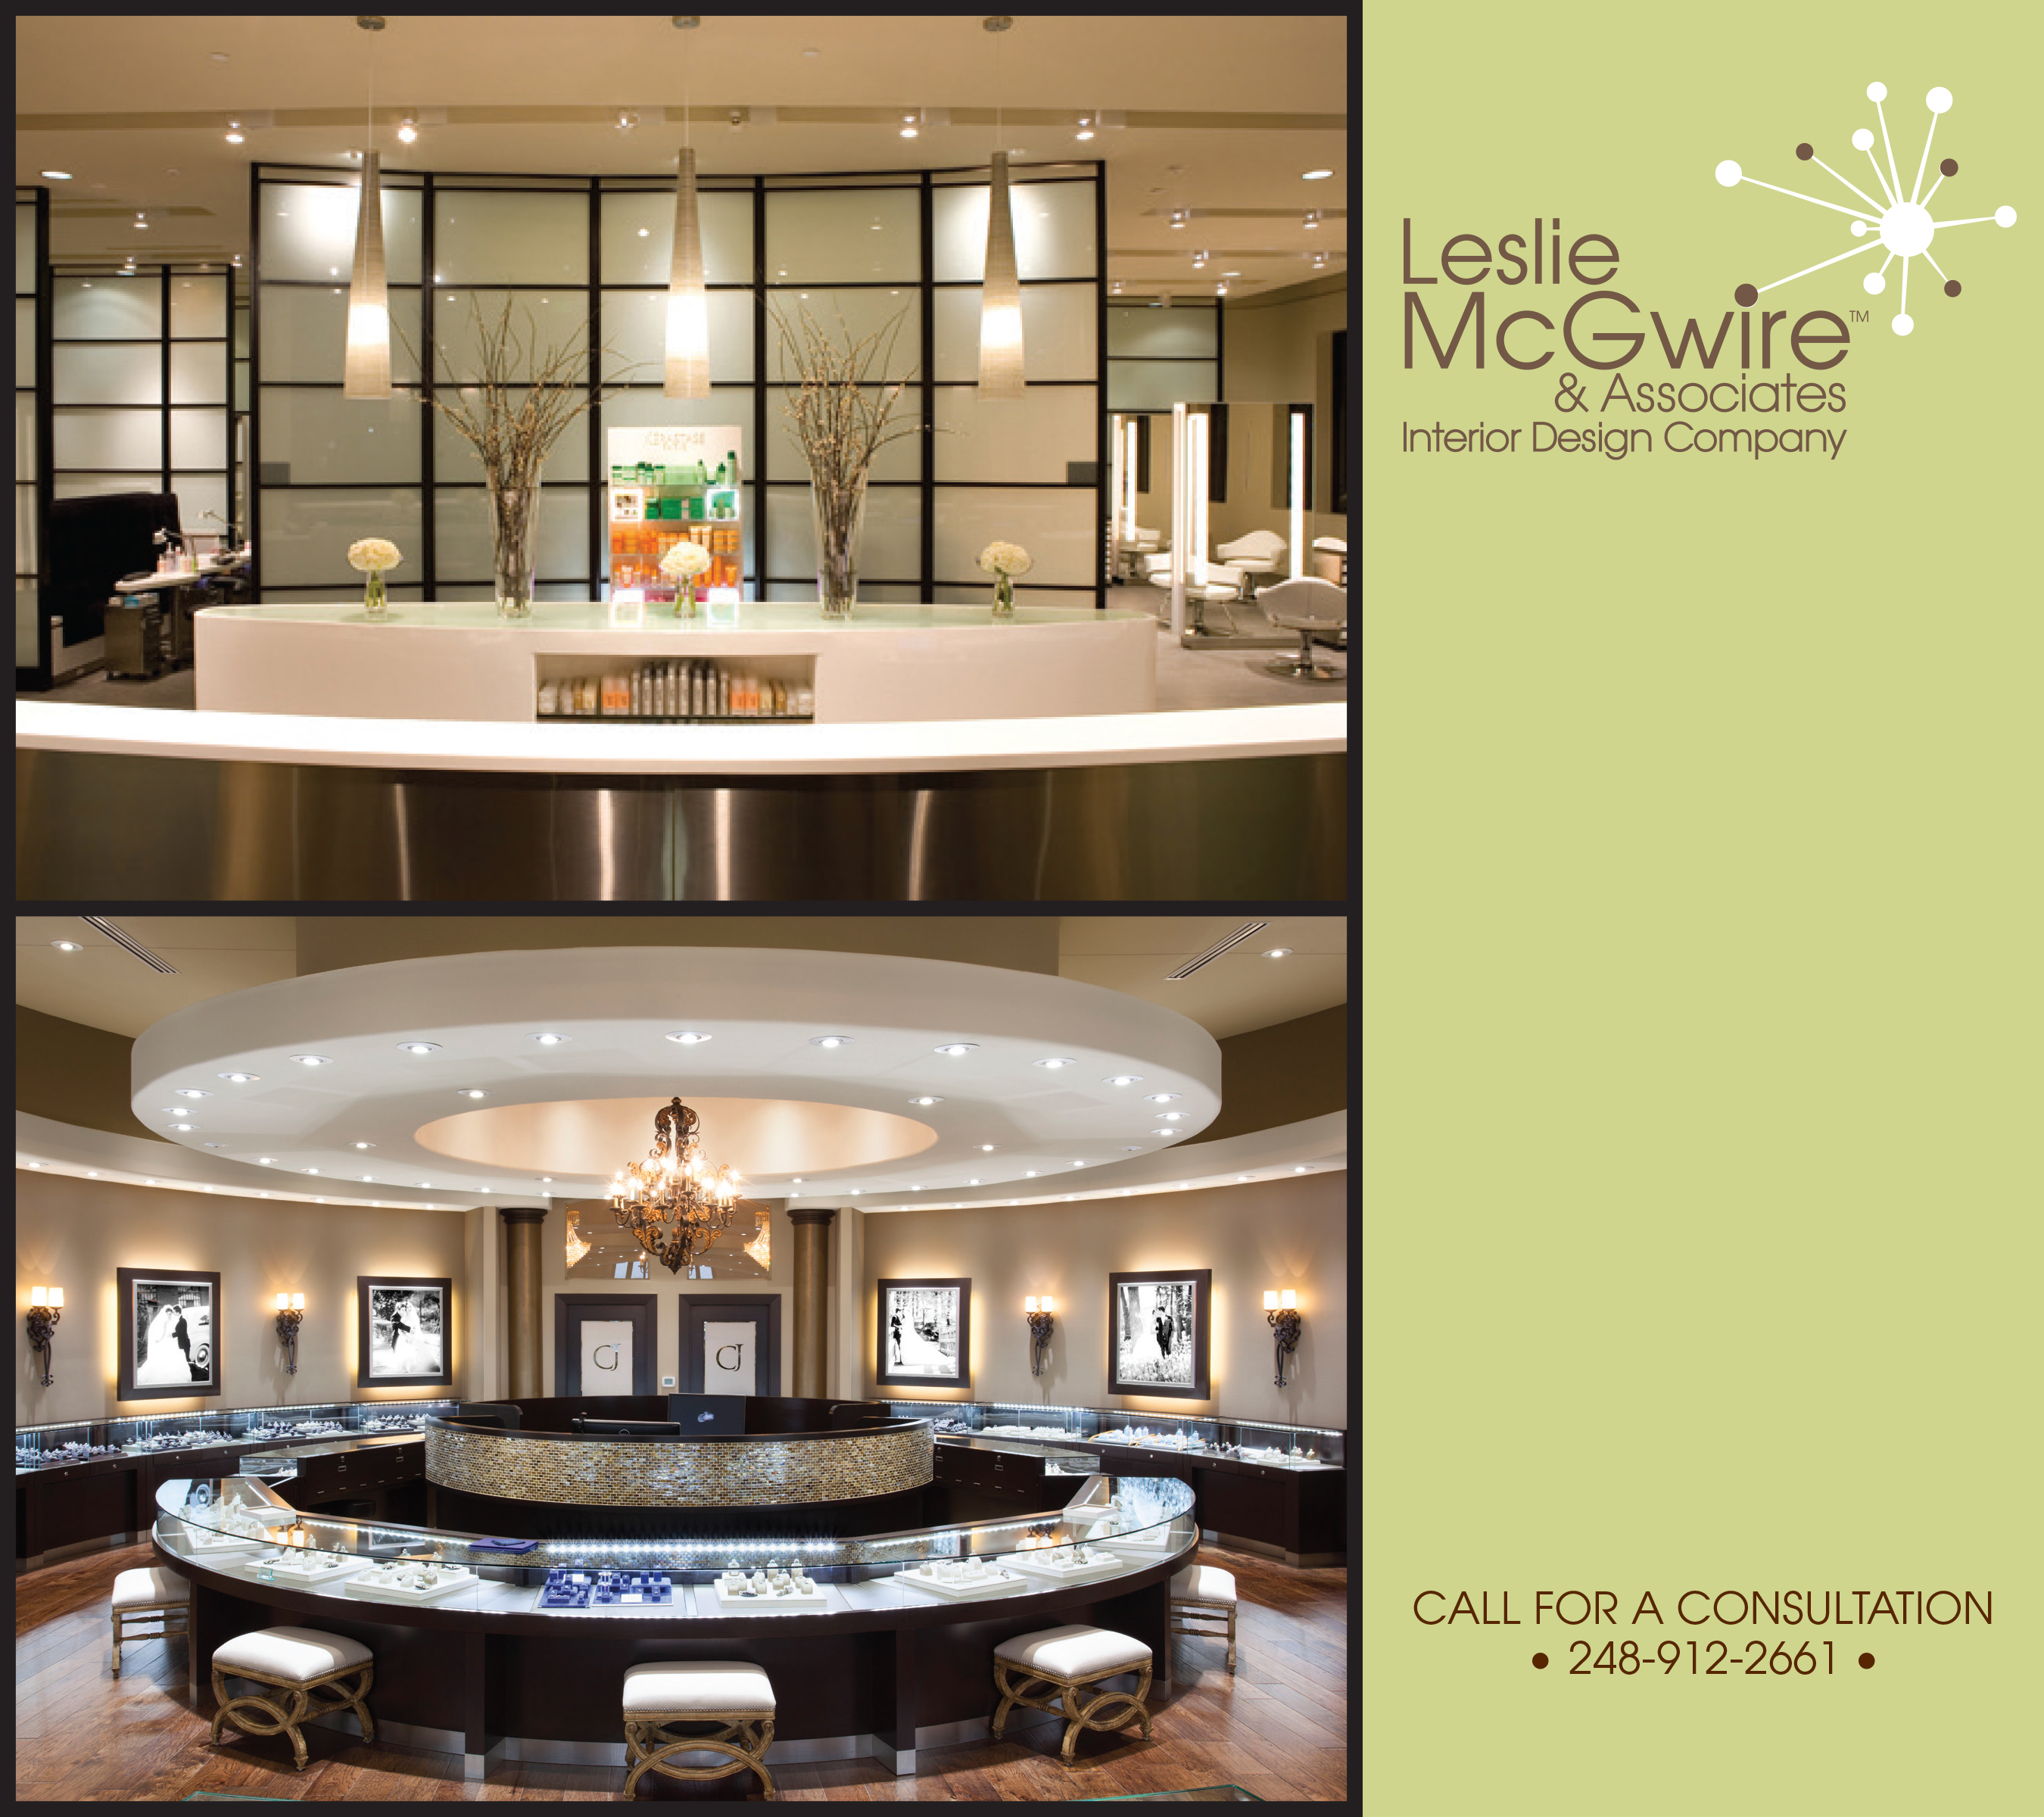 Interior Design Jewelry Stores Retail Spas Salons on Behance